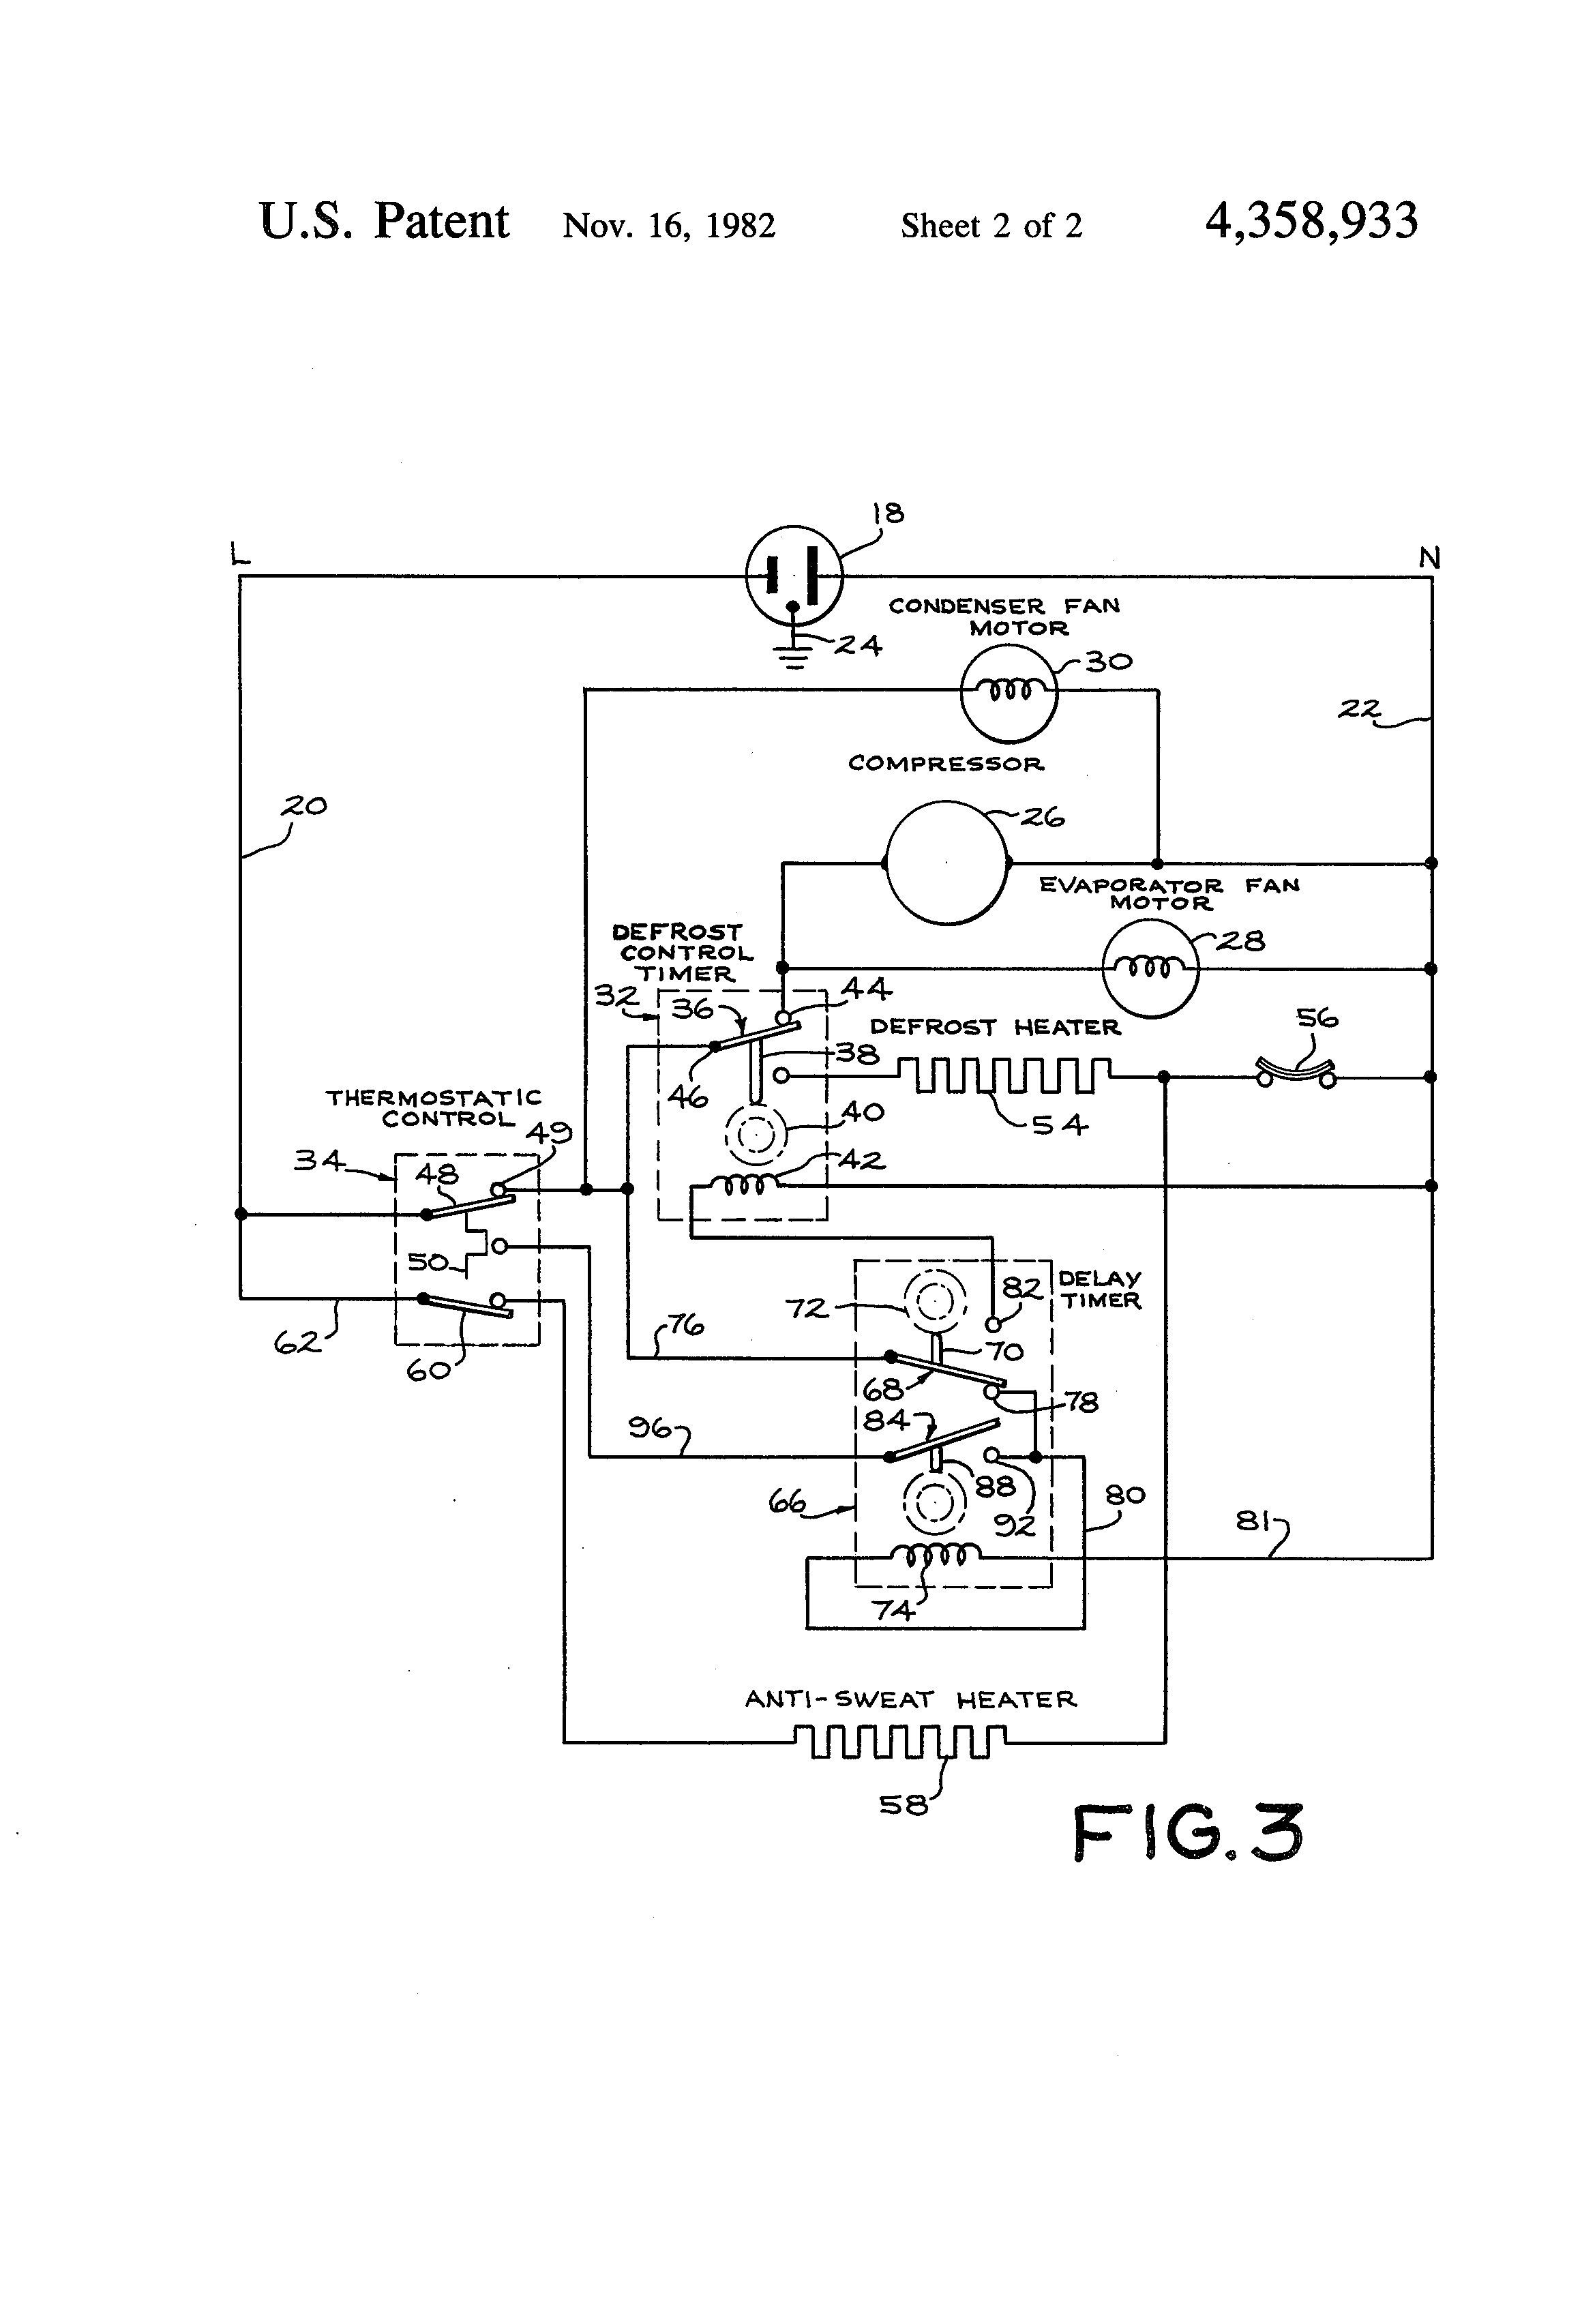 new refrigerator defrost timer wiring diagram in 2020